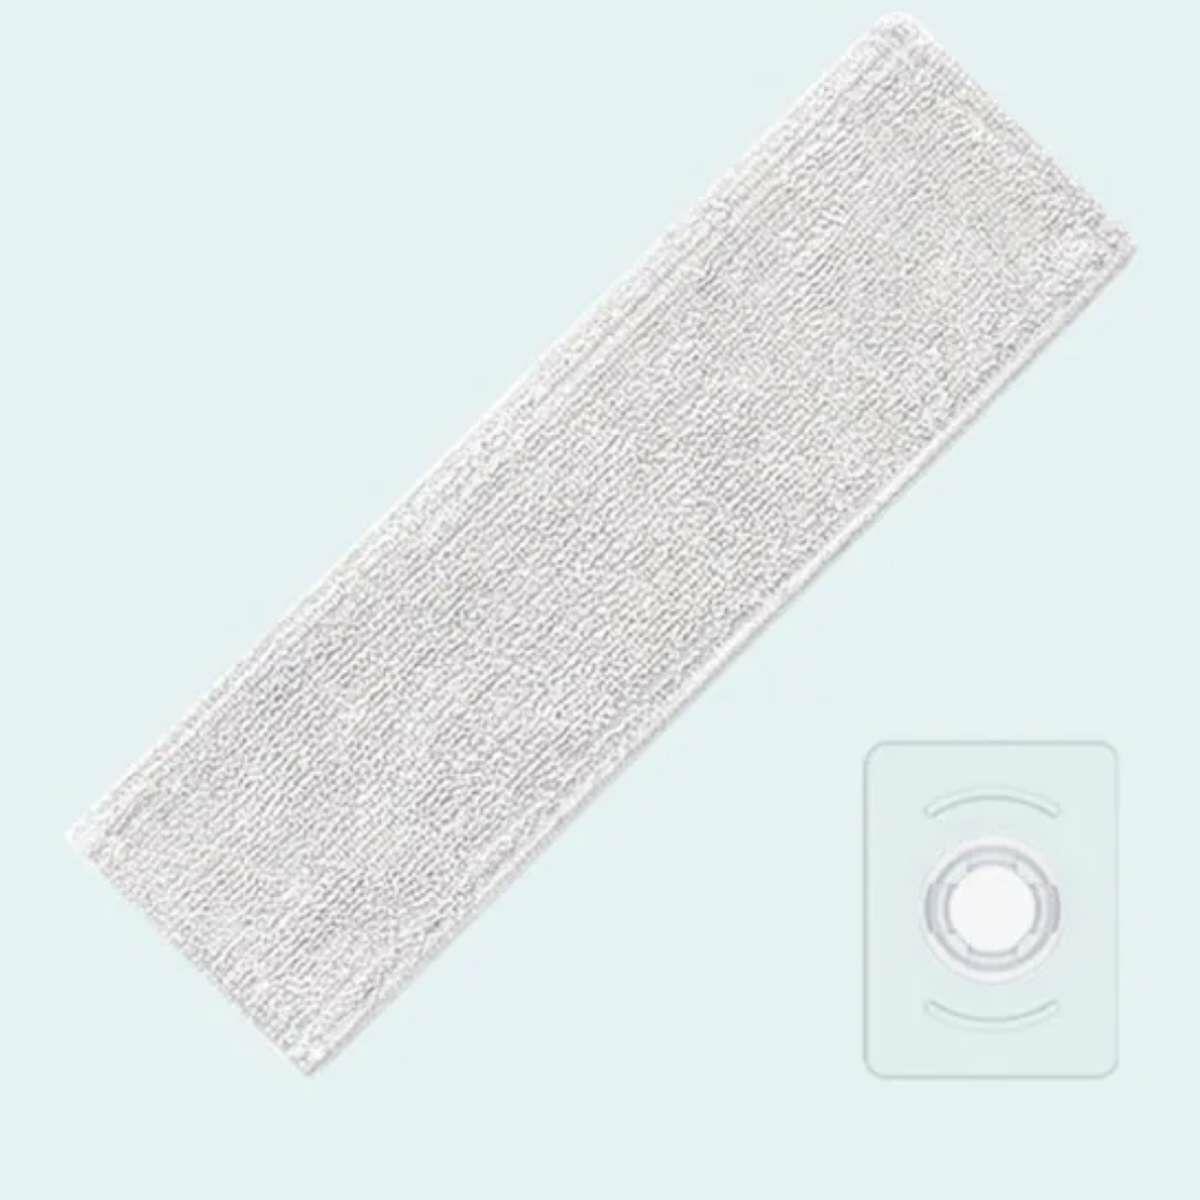 Xiaomi Vacuum Cleaner Mi Handheld Cordless G10 - Mop szett EU BHR4615CN